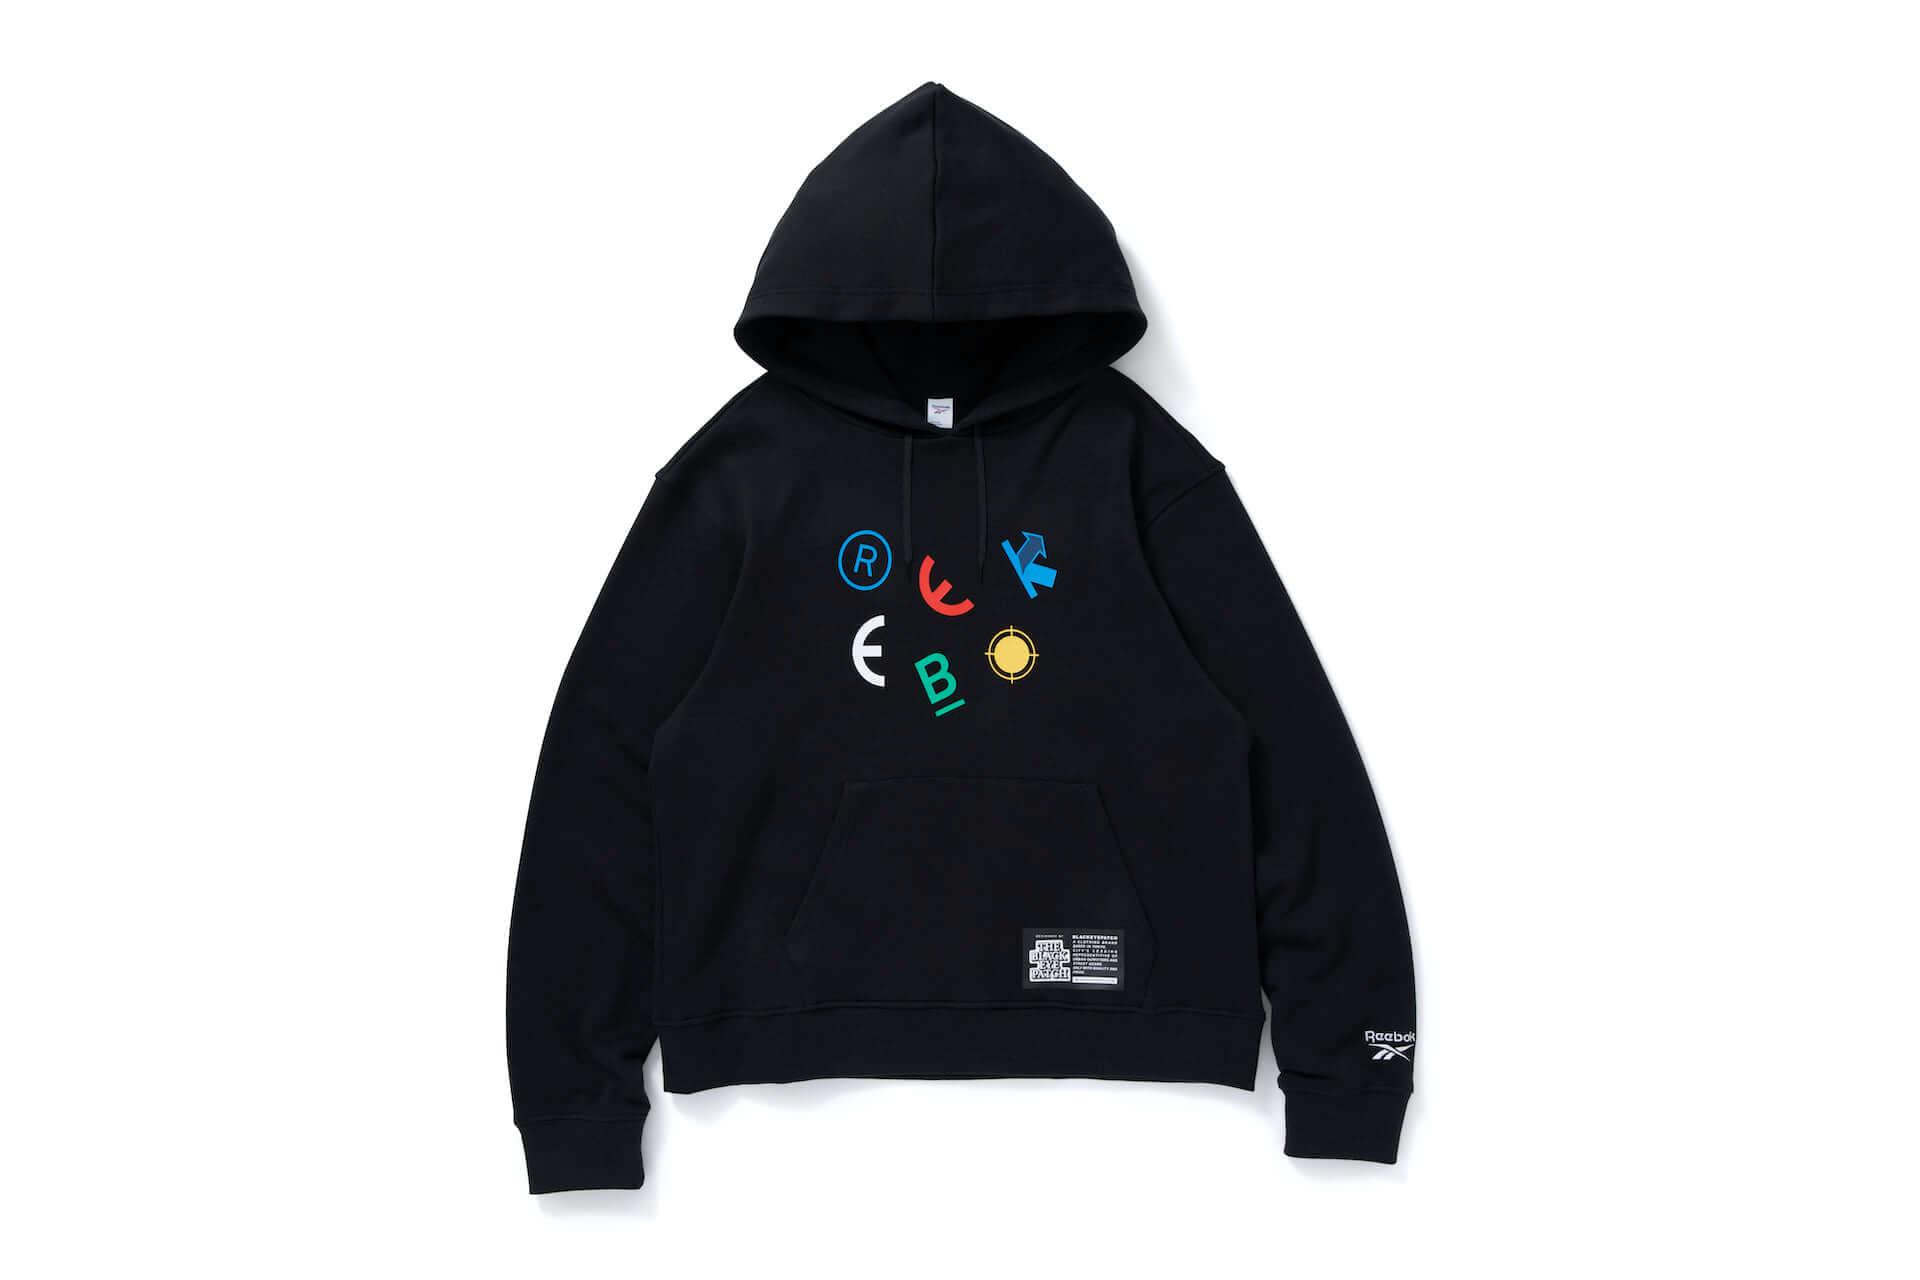 BlackEyePatchがReebokのデザインを再構築!「CLUB C BEP」やTシャツ含むフルコレクションが登場 lf200716_reebok_17-1920x1280